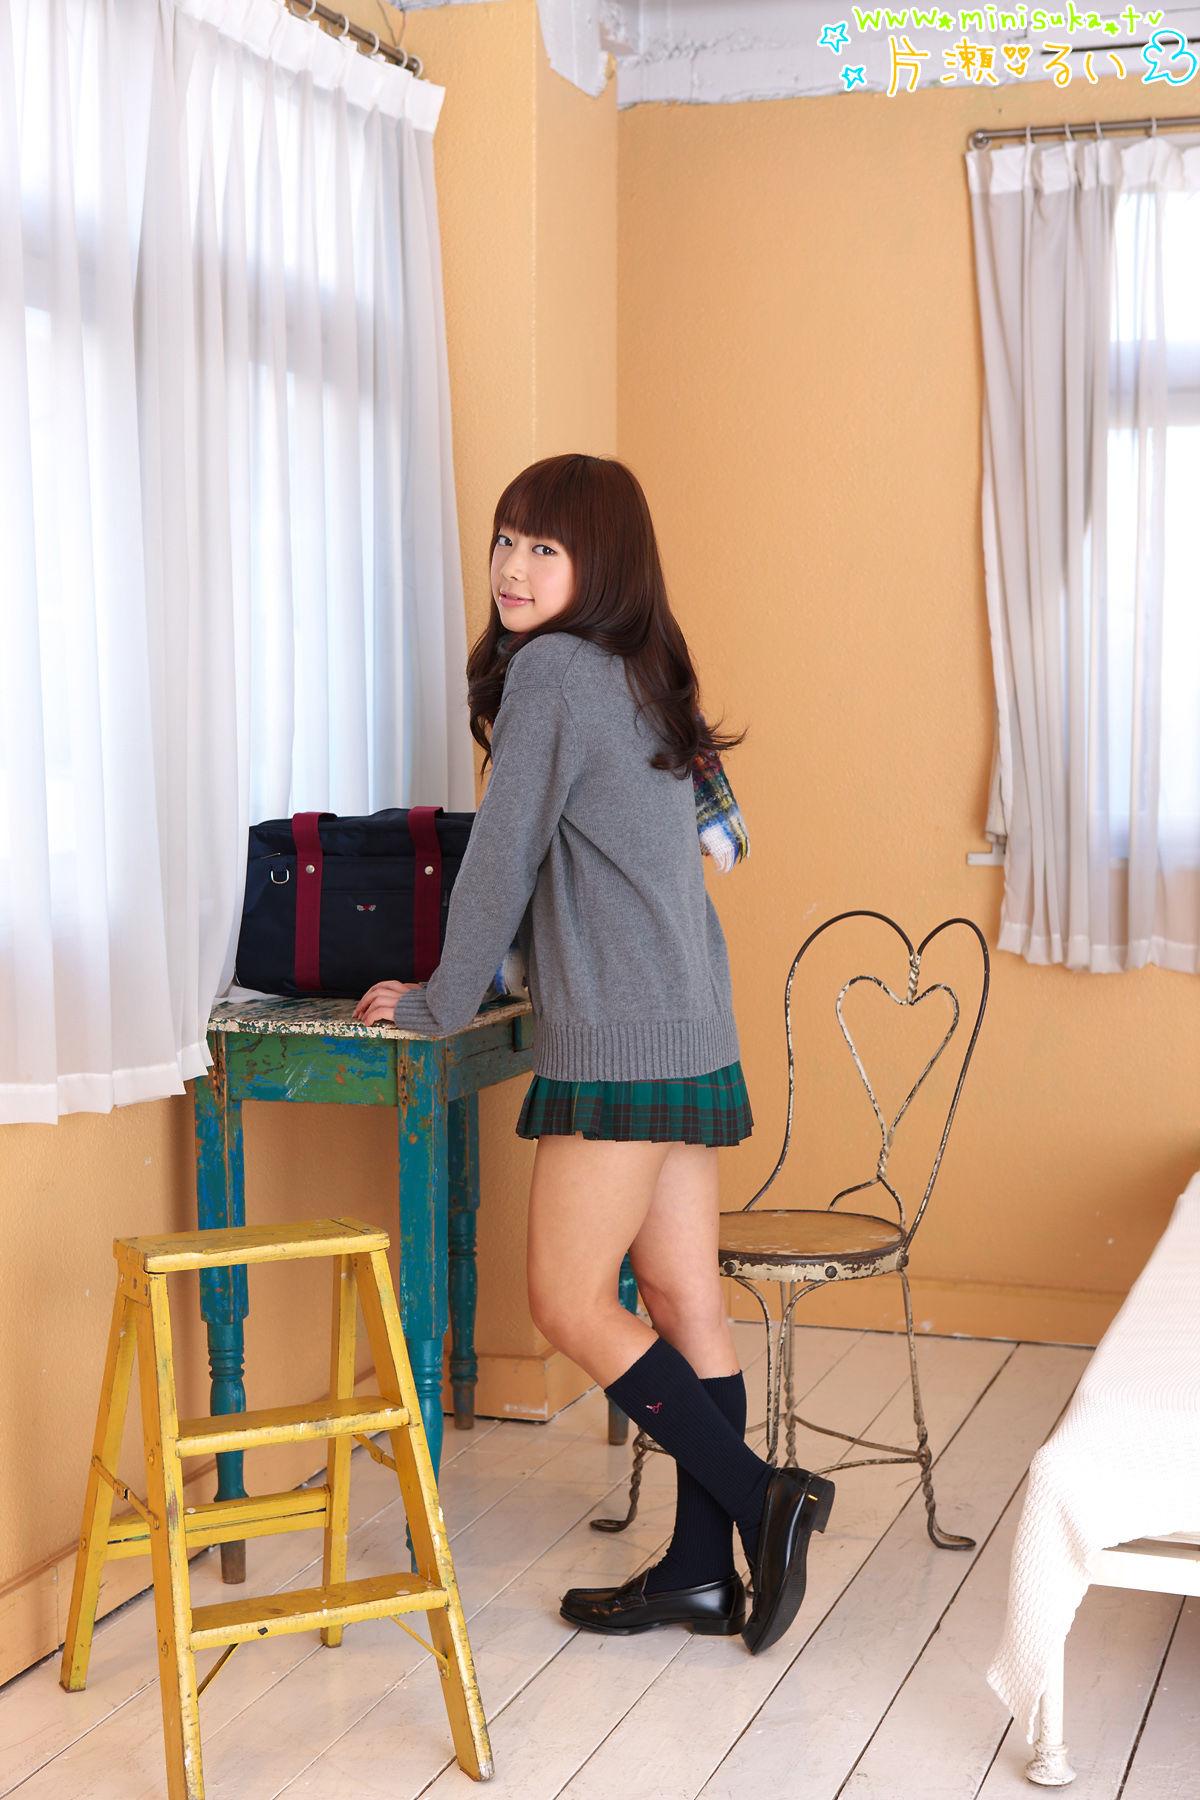 Rui Katase 折田唯菜 - Regular Gallery